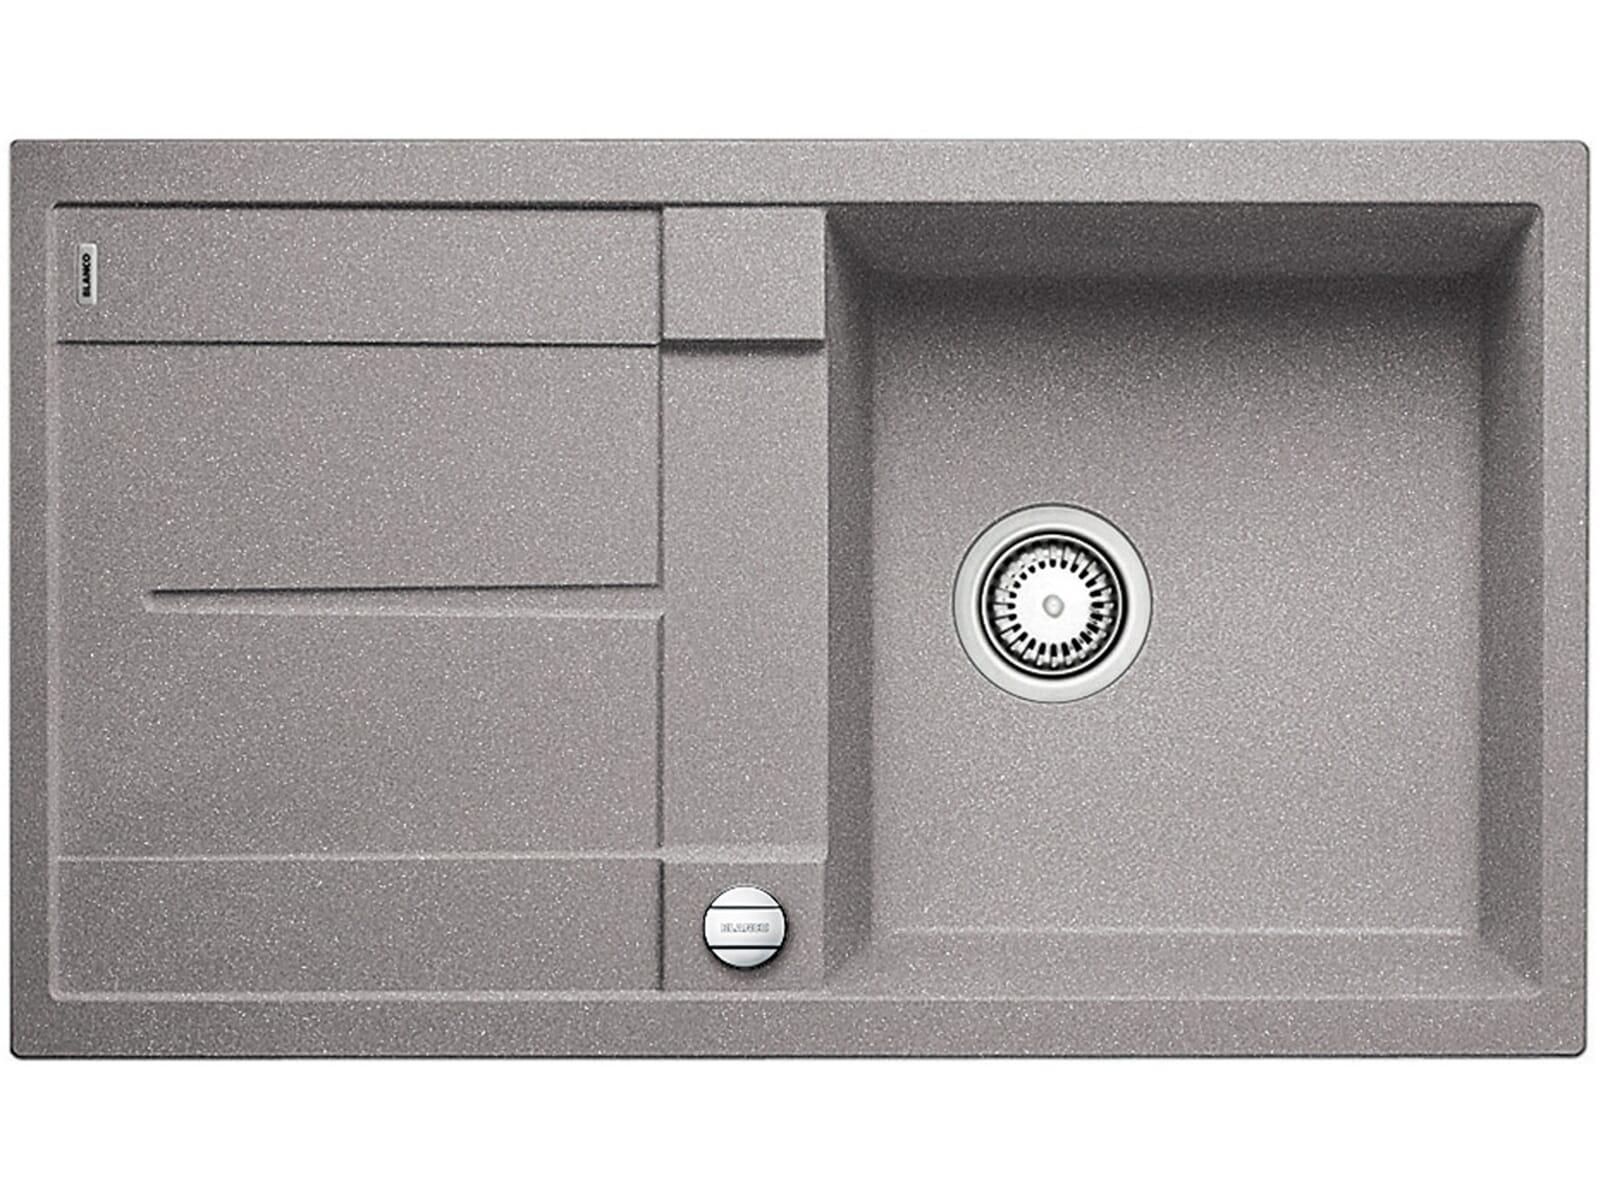 blanco metra 5 s f alumetallic granit sp le 50er us grau fl chenb ndig ebay. Black Bedroom Furniture Sets. Home Design Ideas